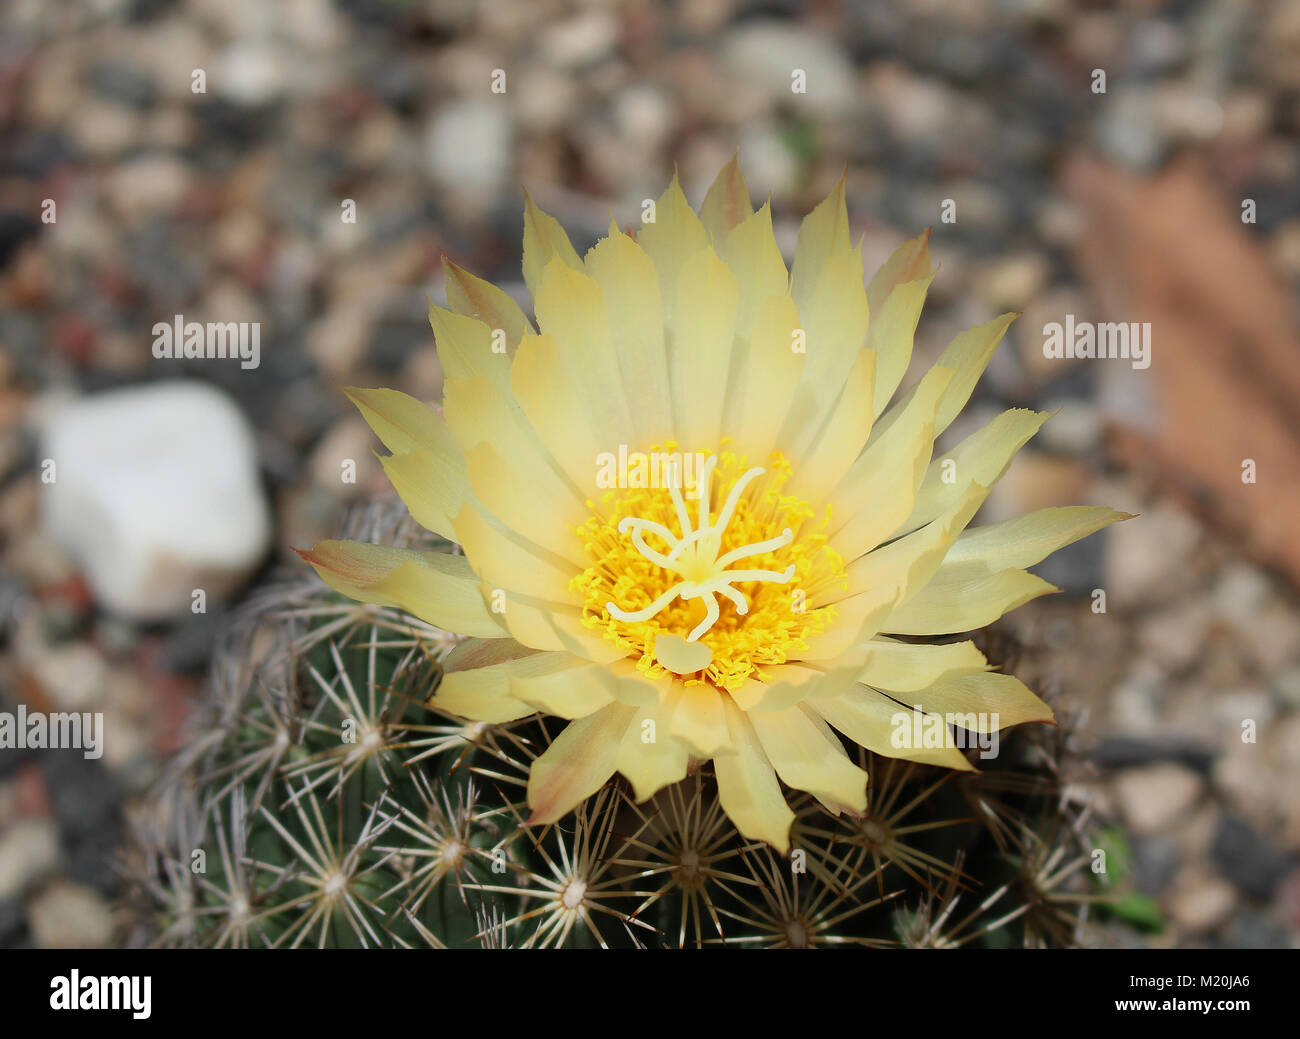 Beautiful Cactus With Yellow Flower Stock Photo 173347390 Alamy